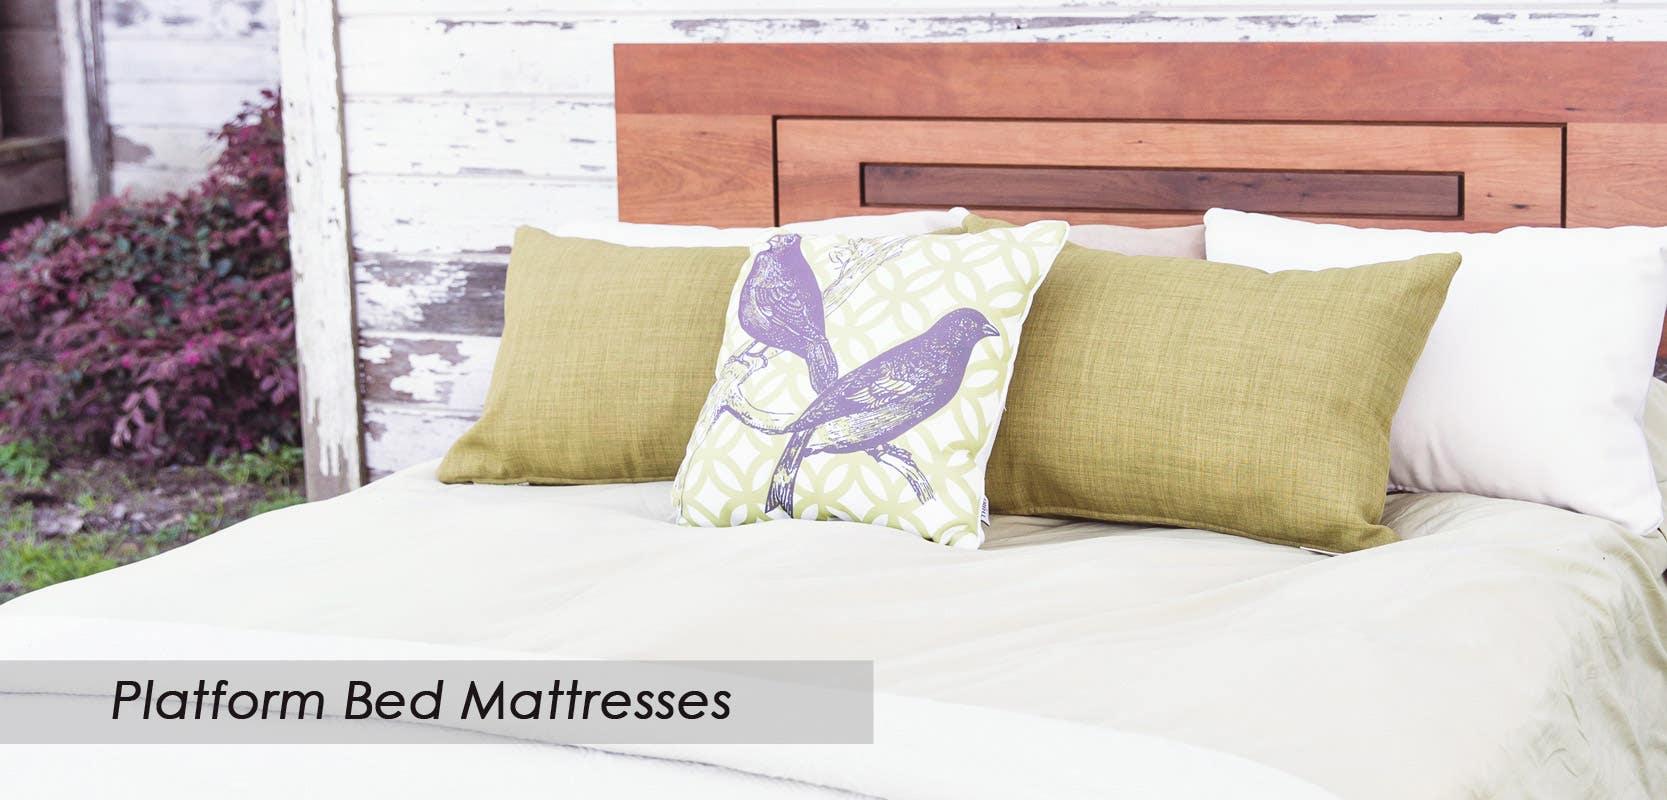 Platform bed mattresses